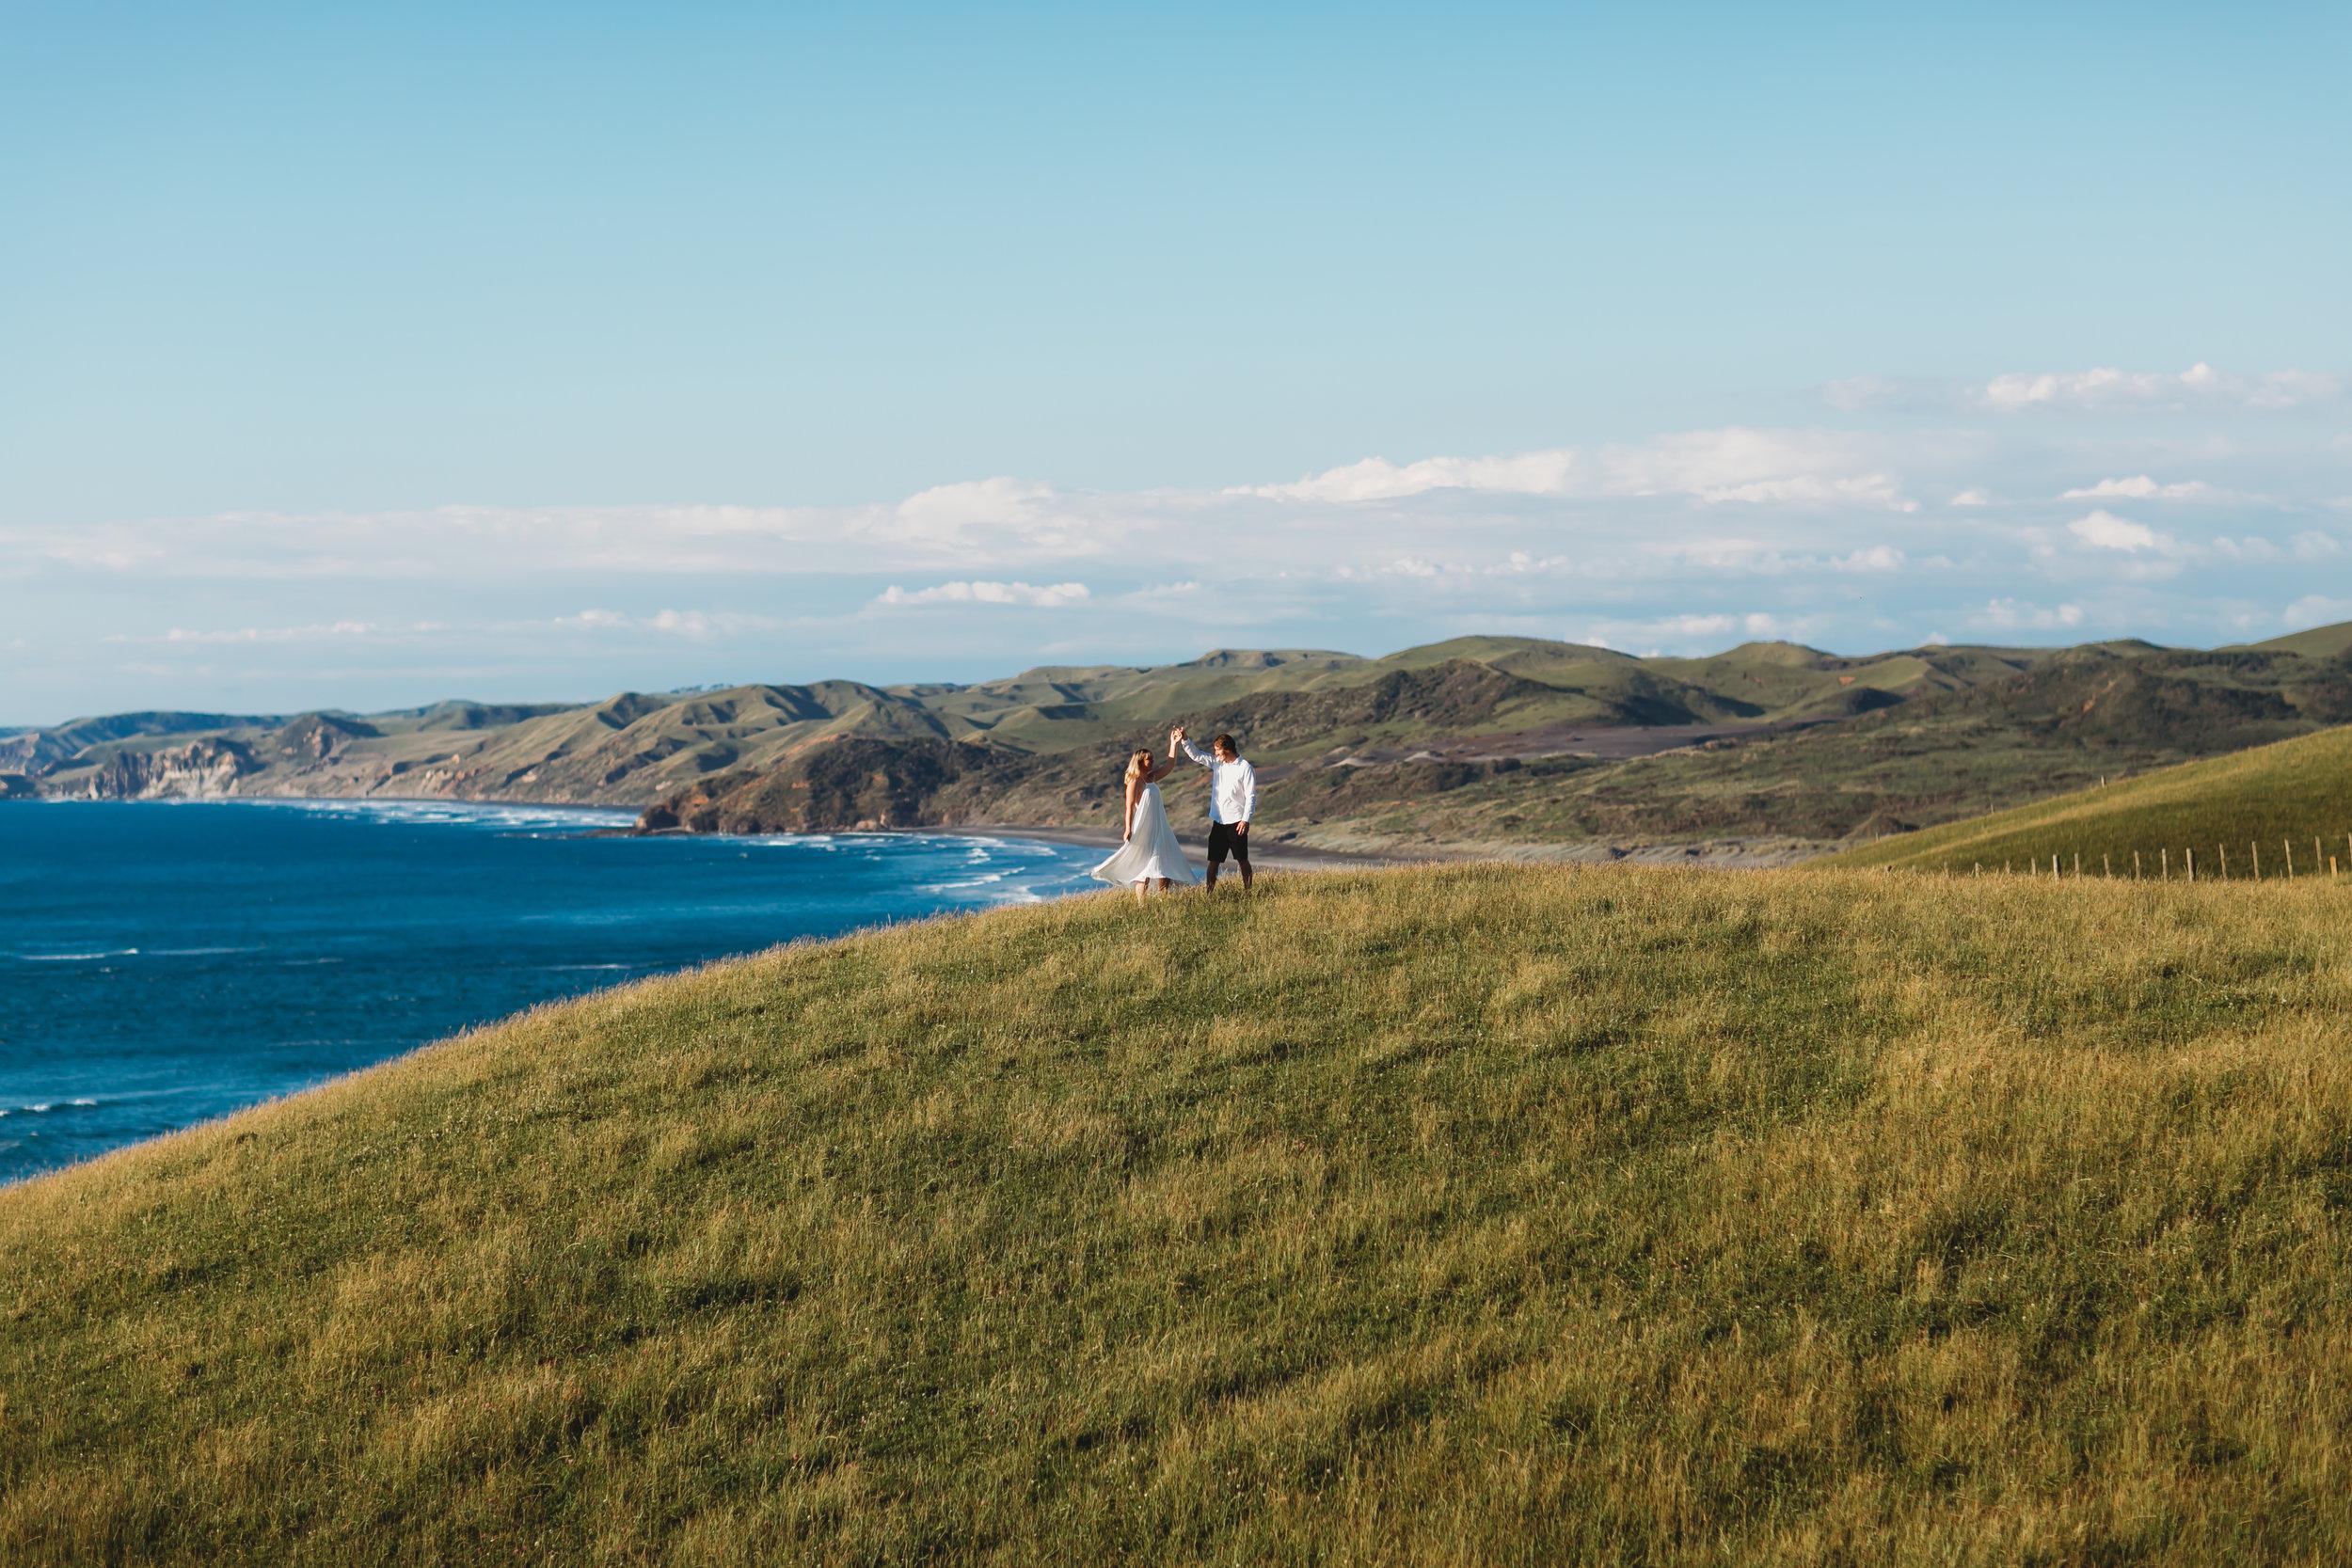 Raglan-beach-couples-engagement-photo-shoot (16 of 79).jpg